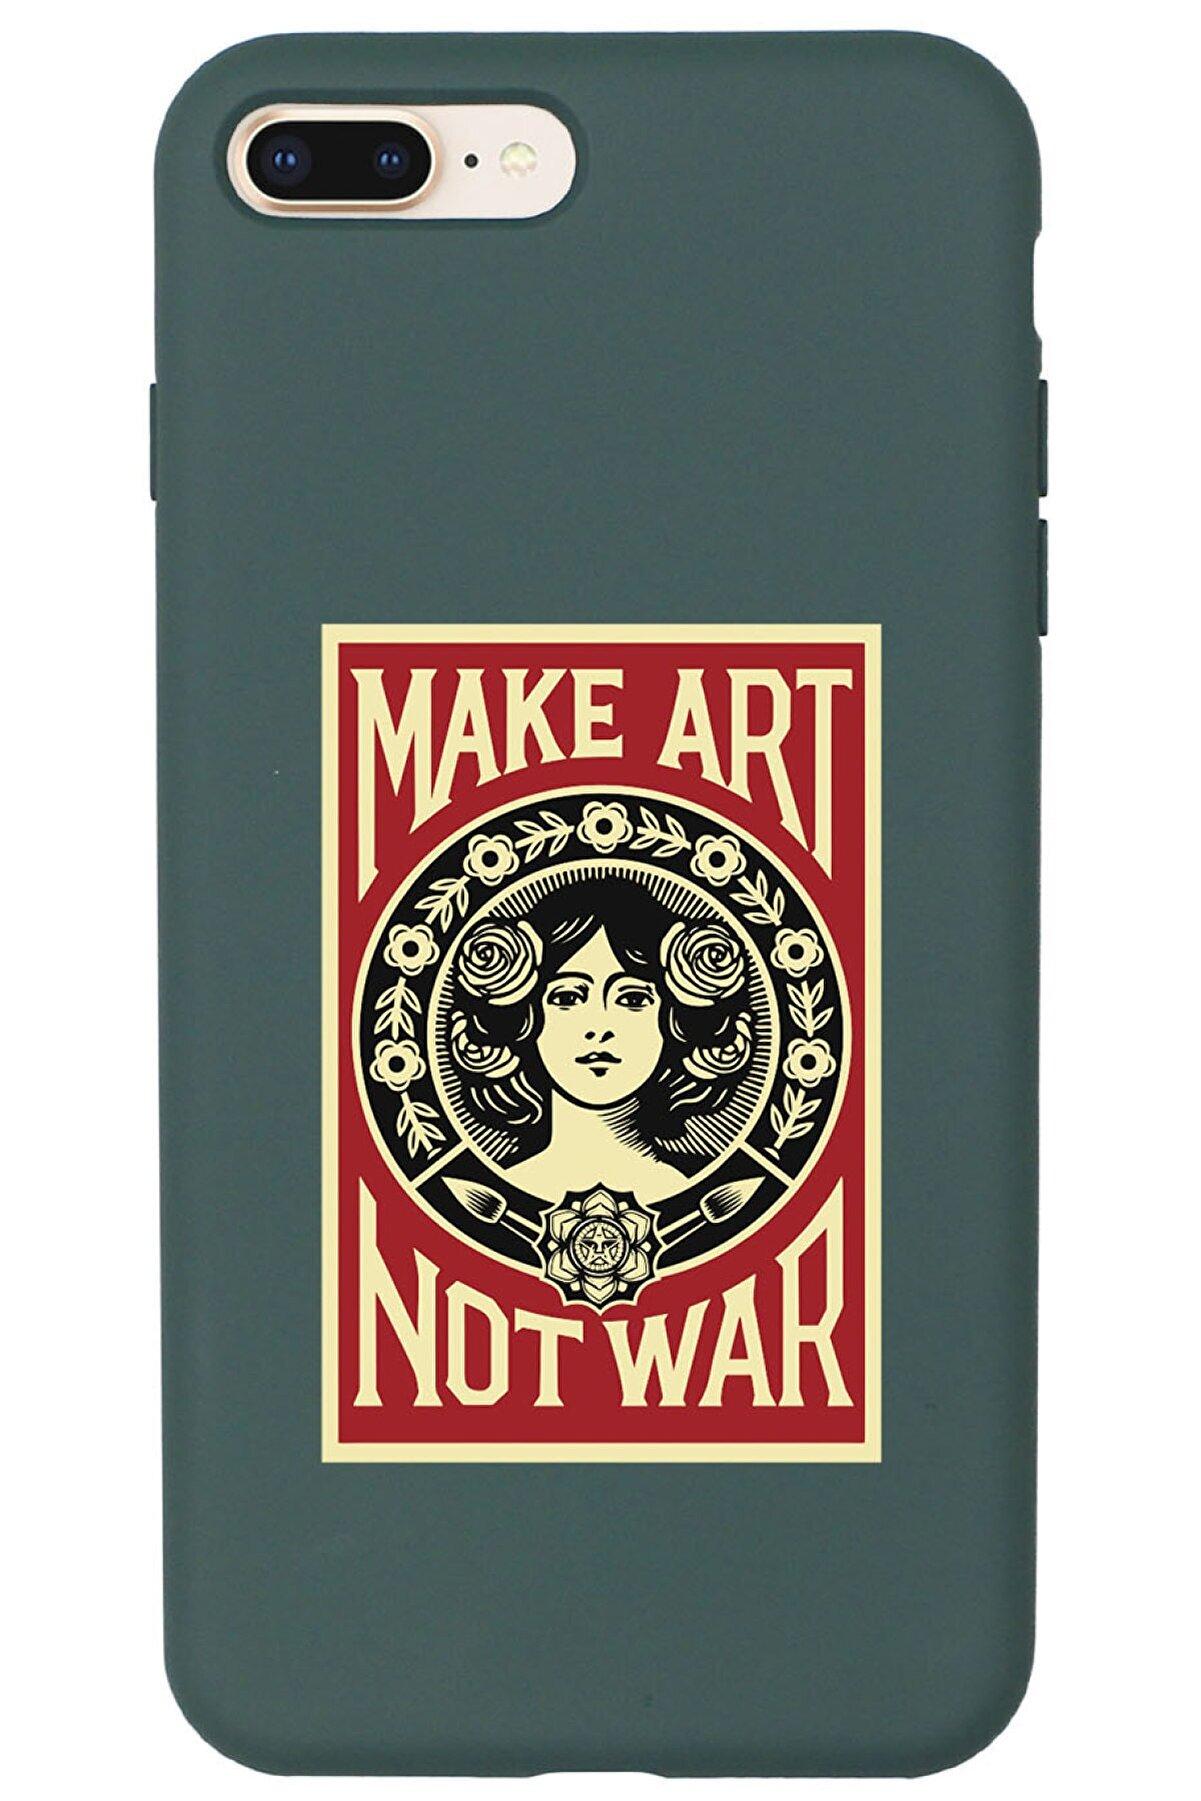 shoptocase Iphone 7 Plus Lansman Make Art Not War Desenli Telefon Kılıfı